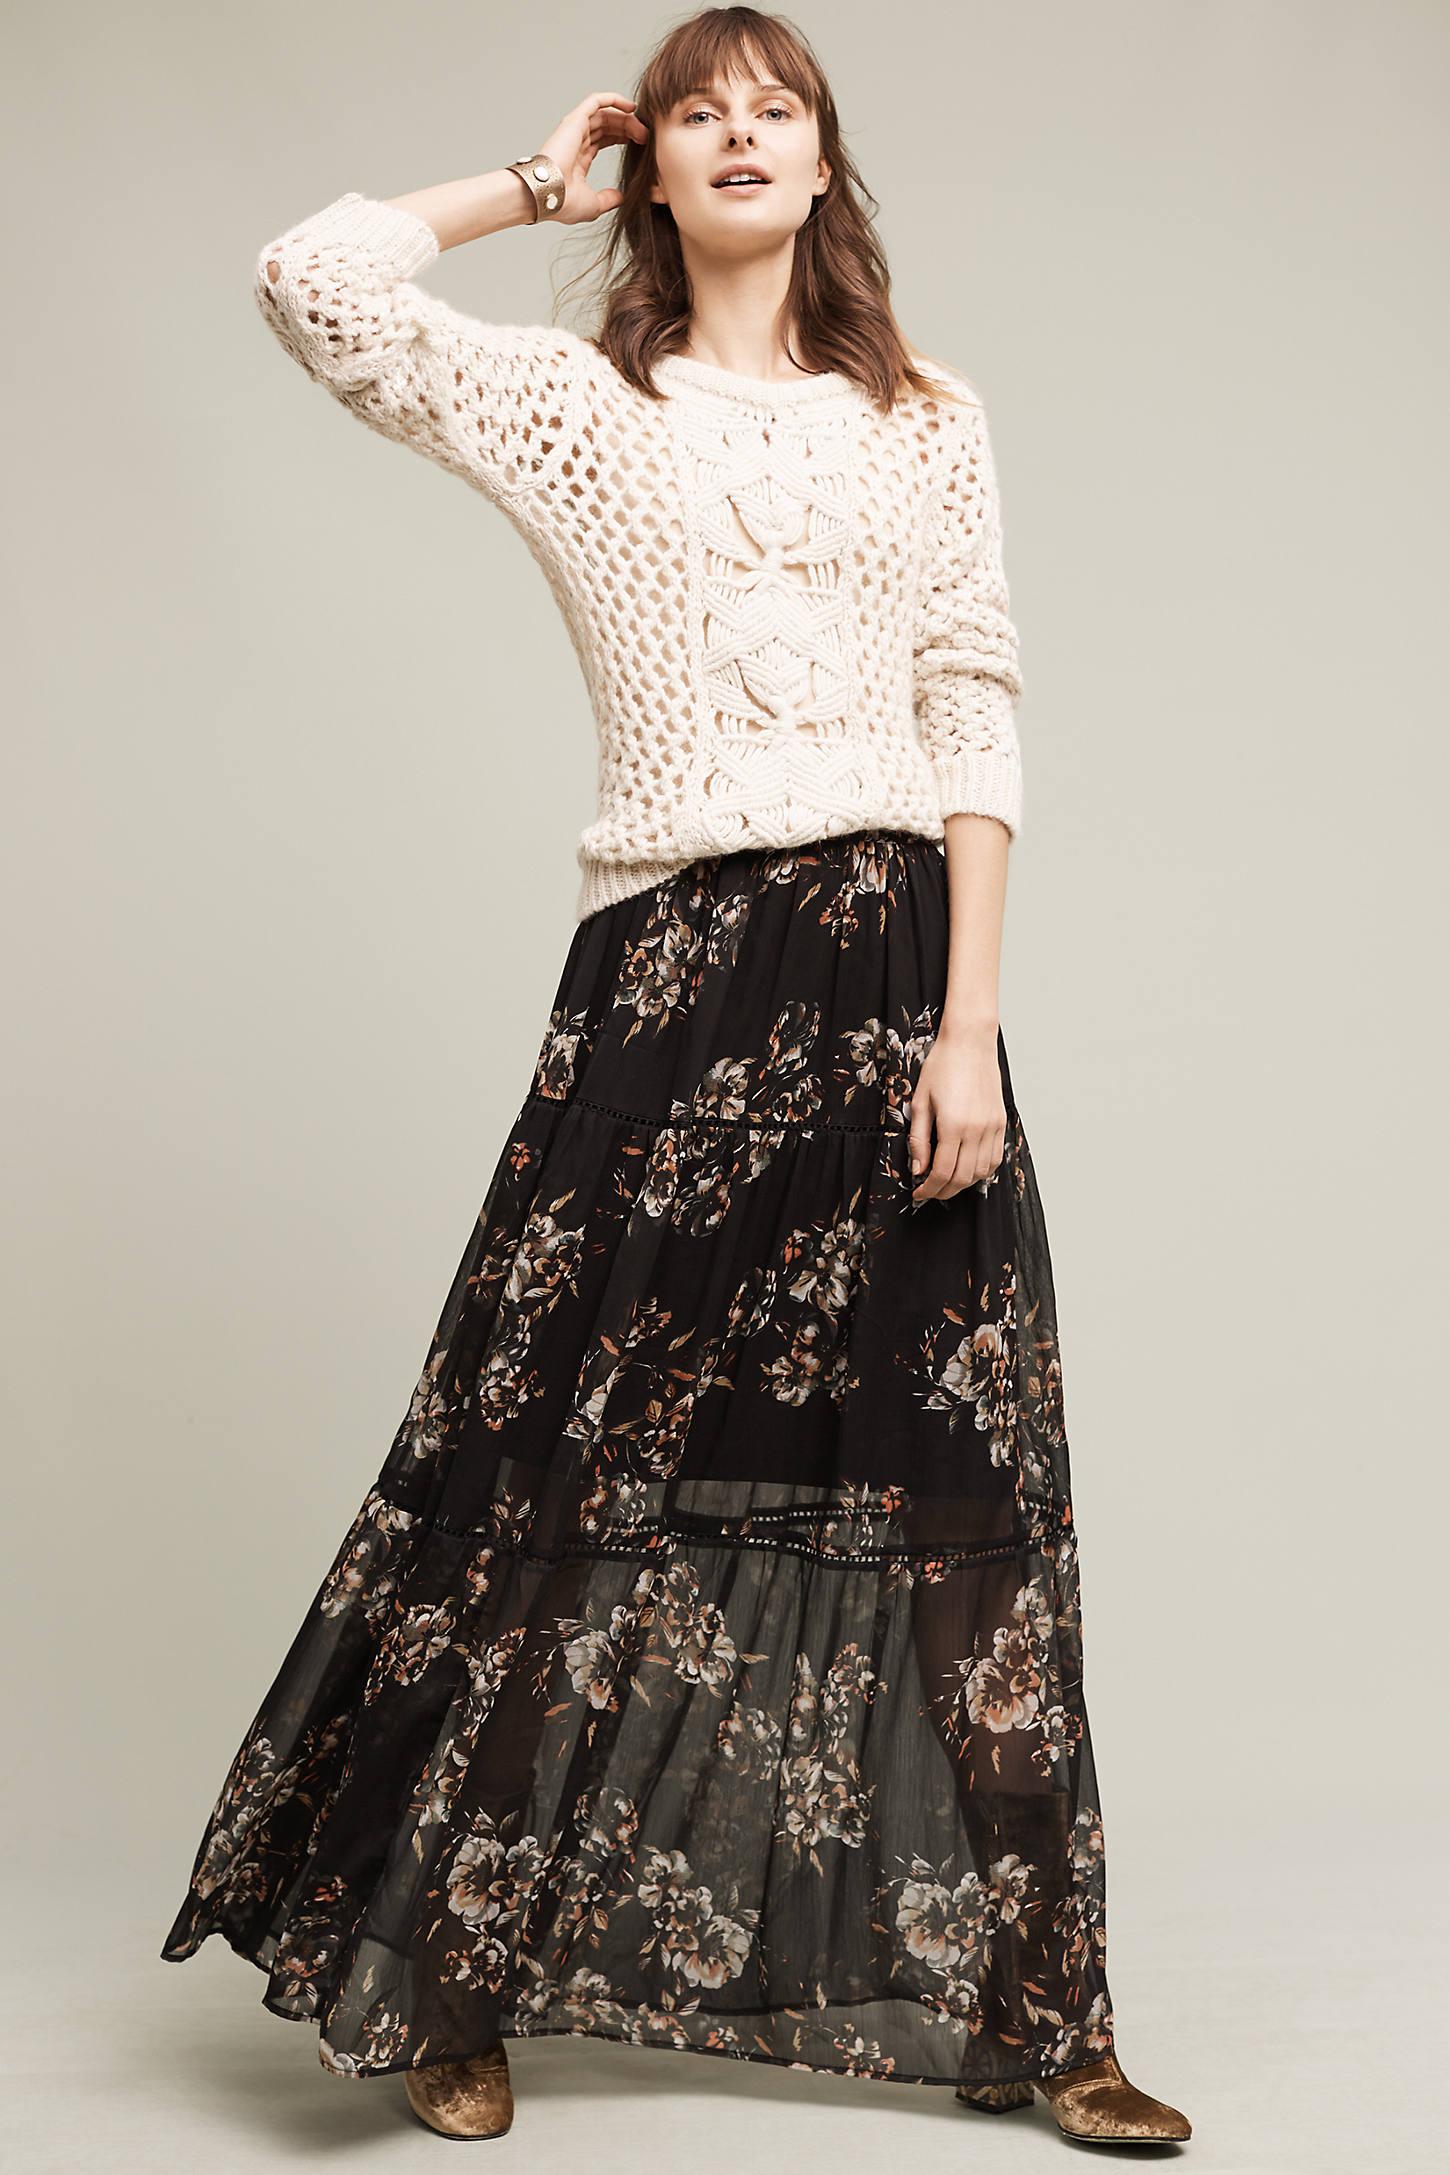 Izabelle Floral Maxi Skirt, Black